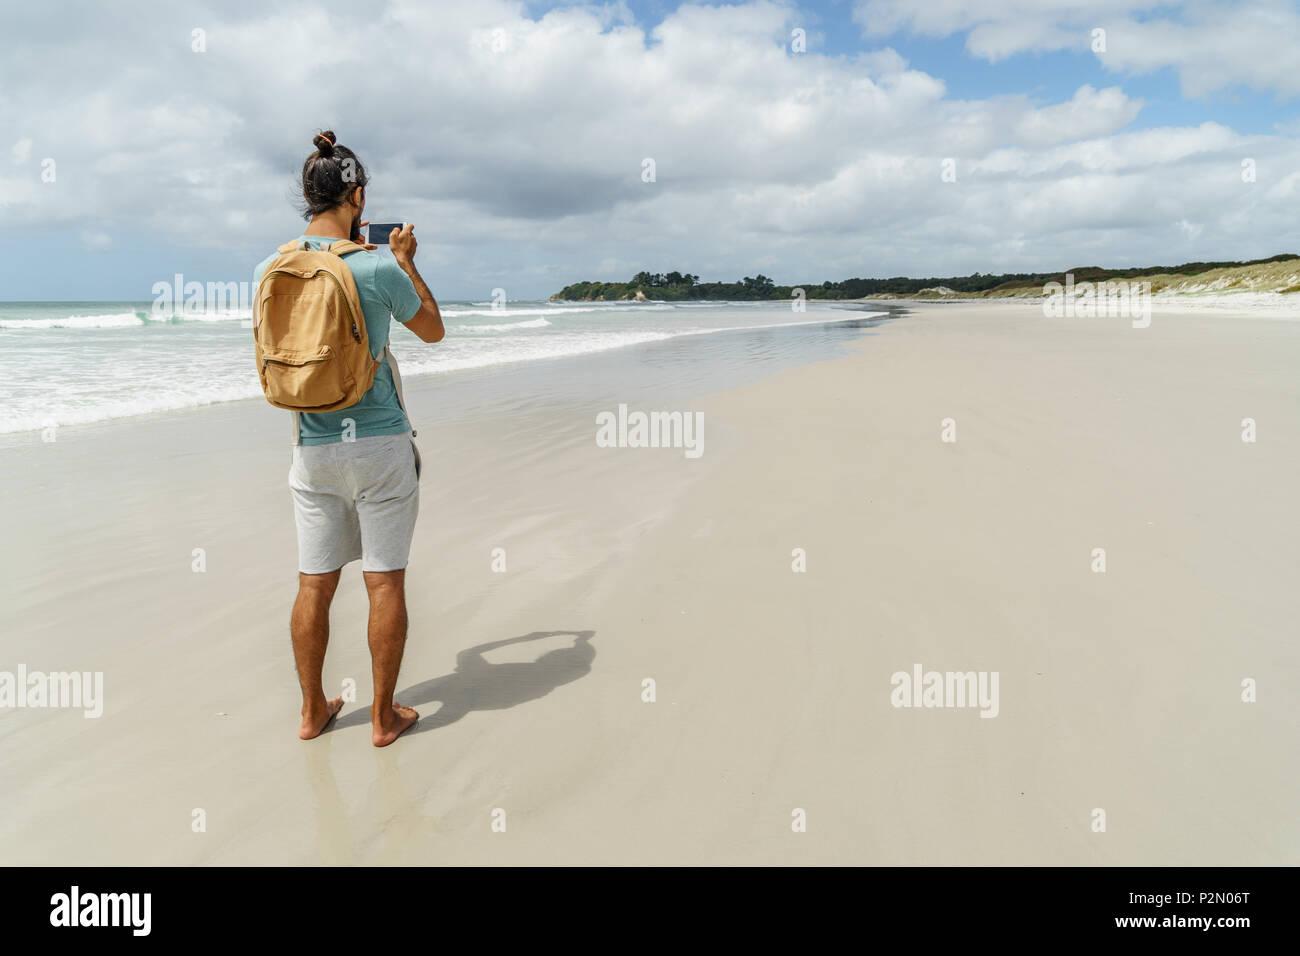 rear view of man taking photo of coastline with smartphone, Rarawa beach, New Zealand - Stock Image